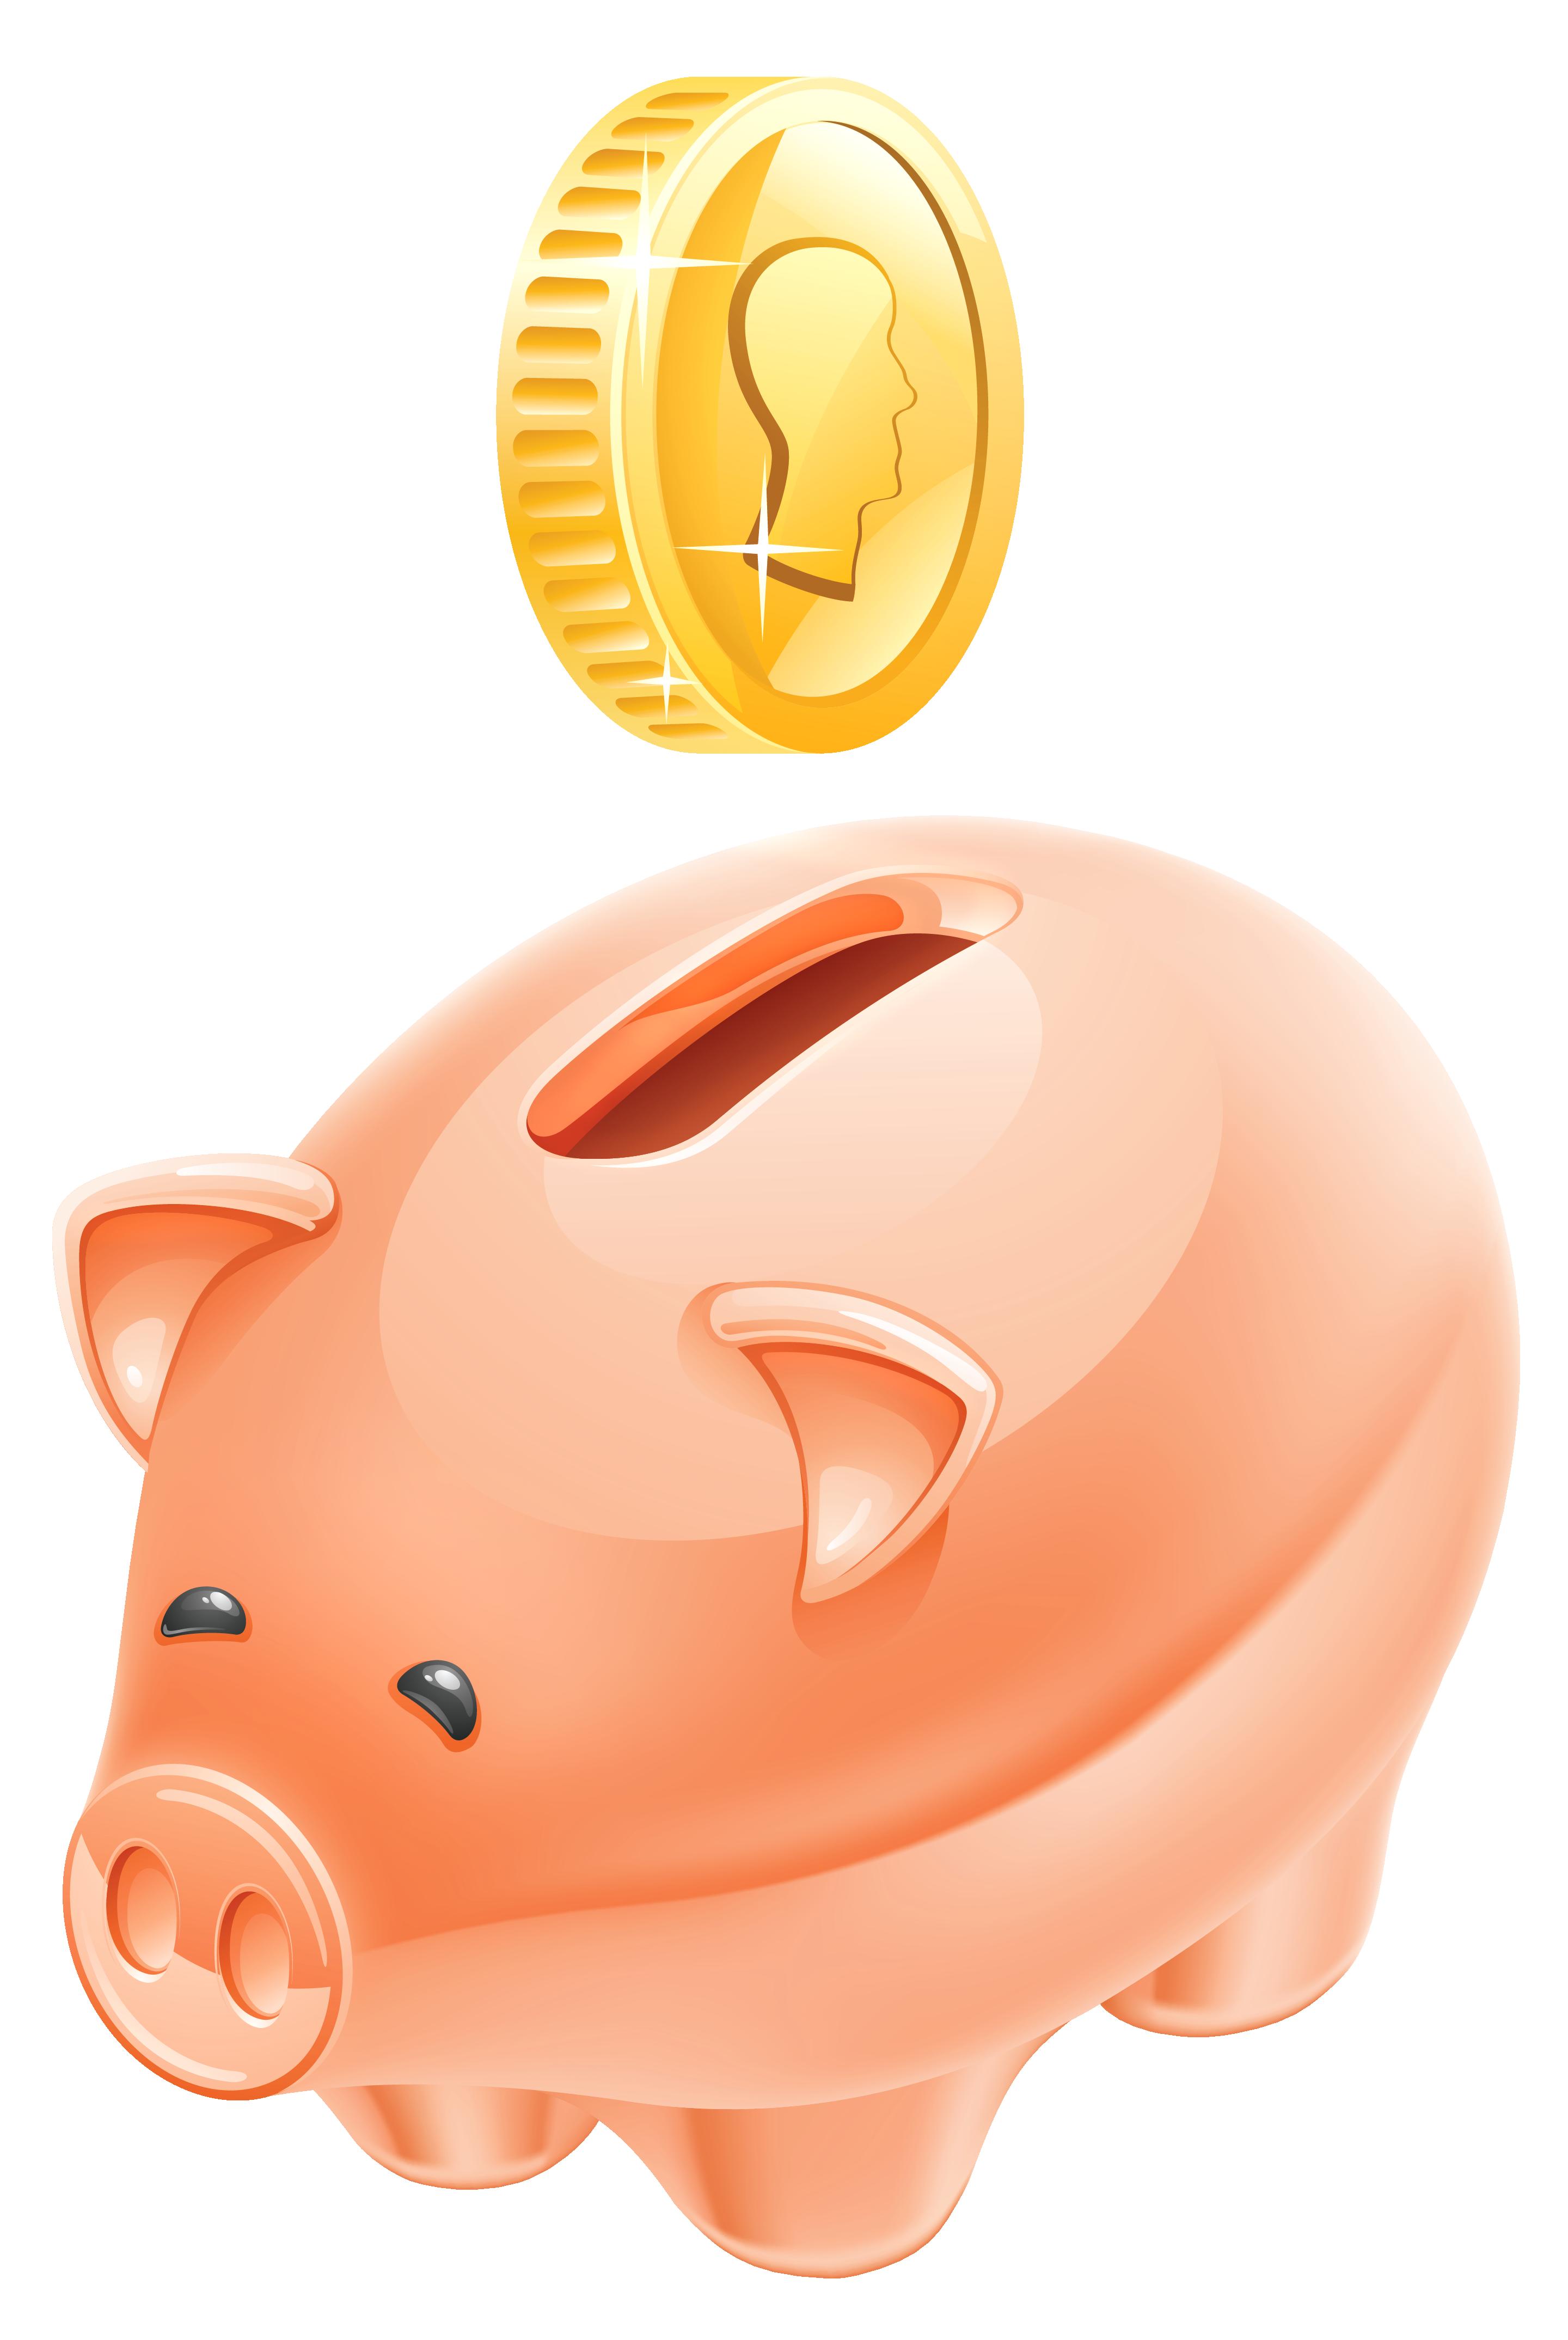 2880x4297 Piggy Bank Clipart Picture